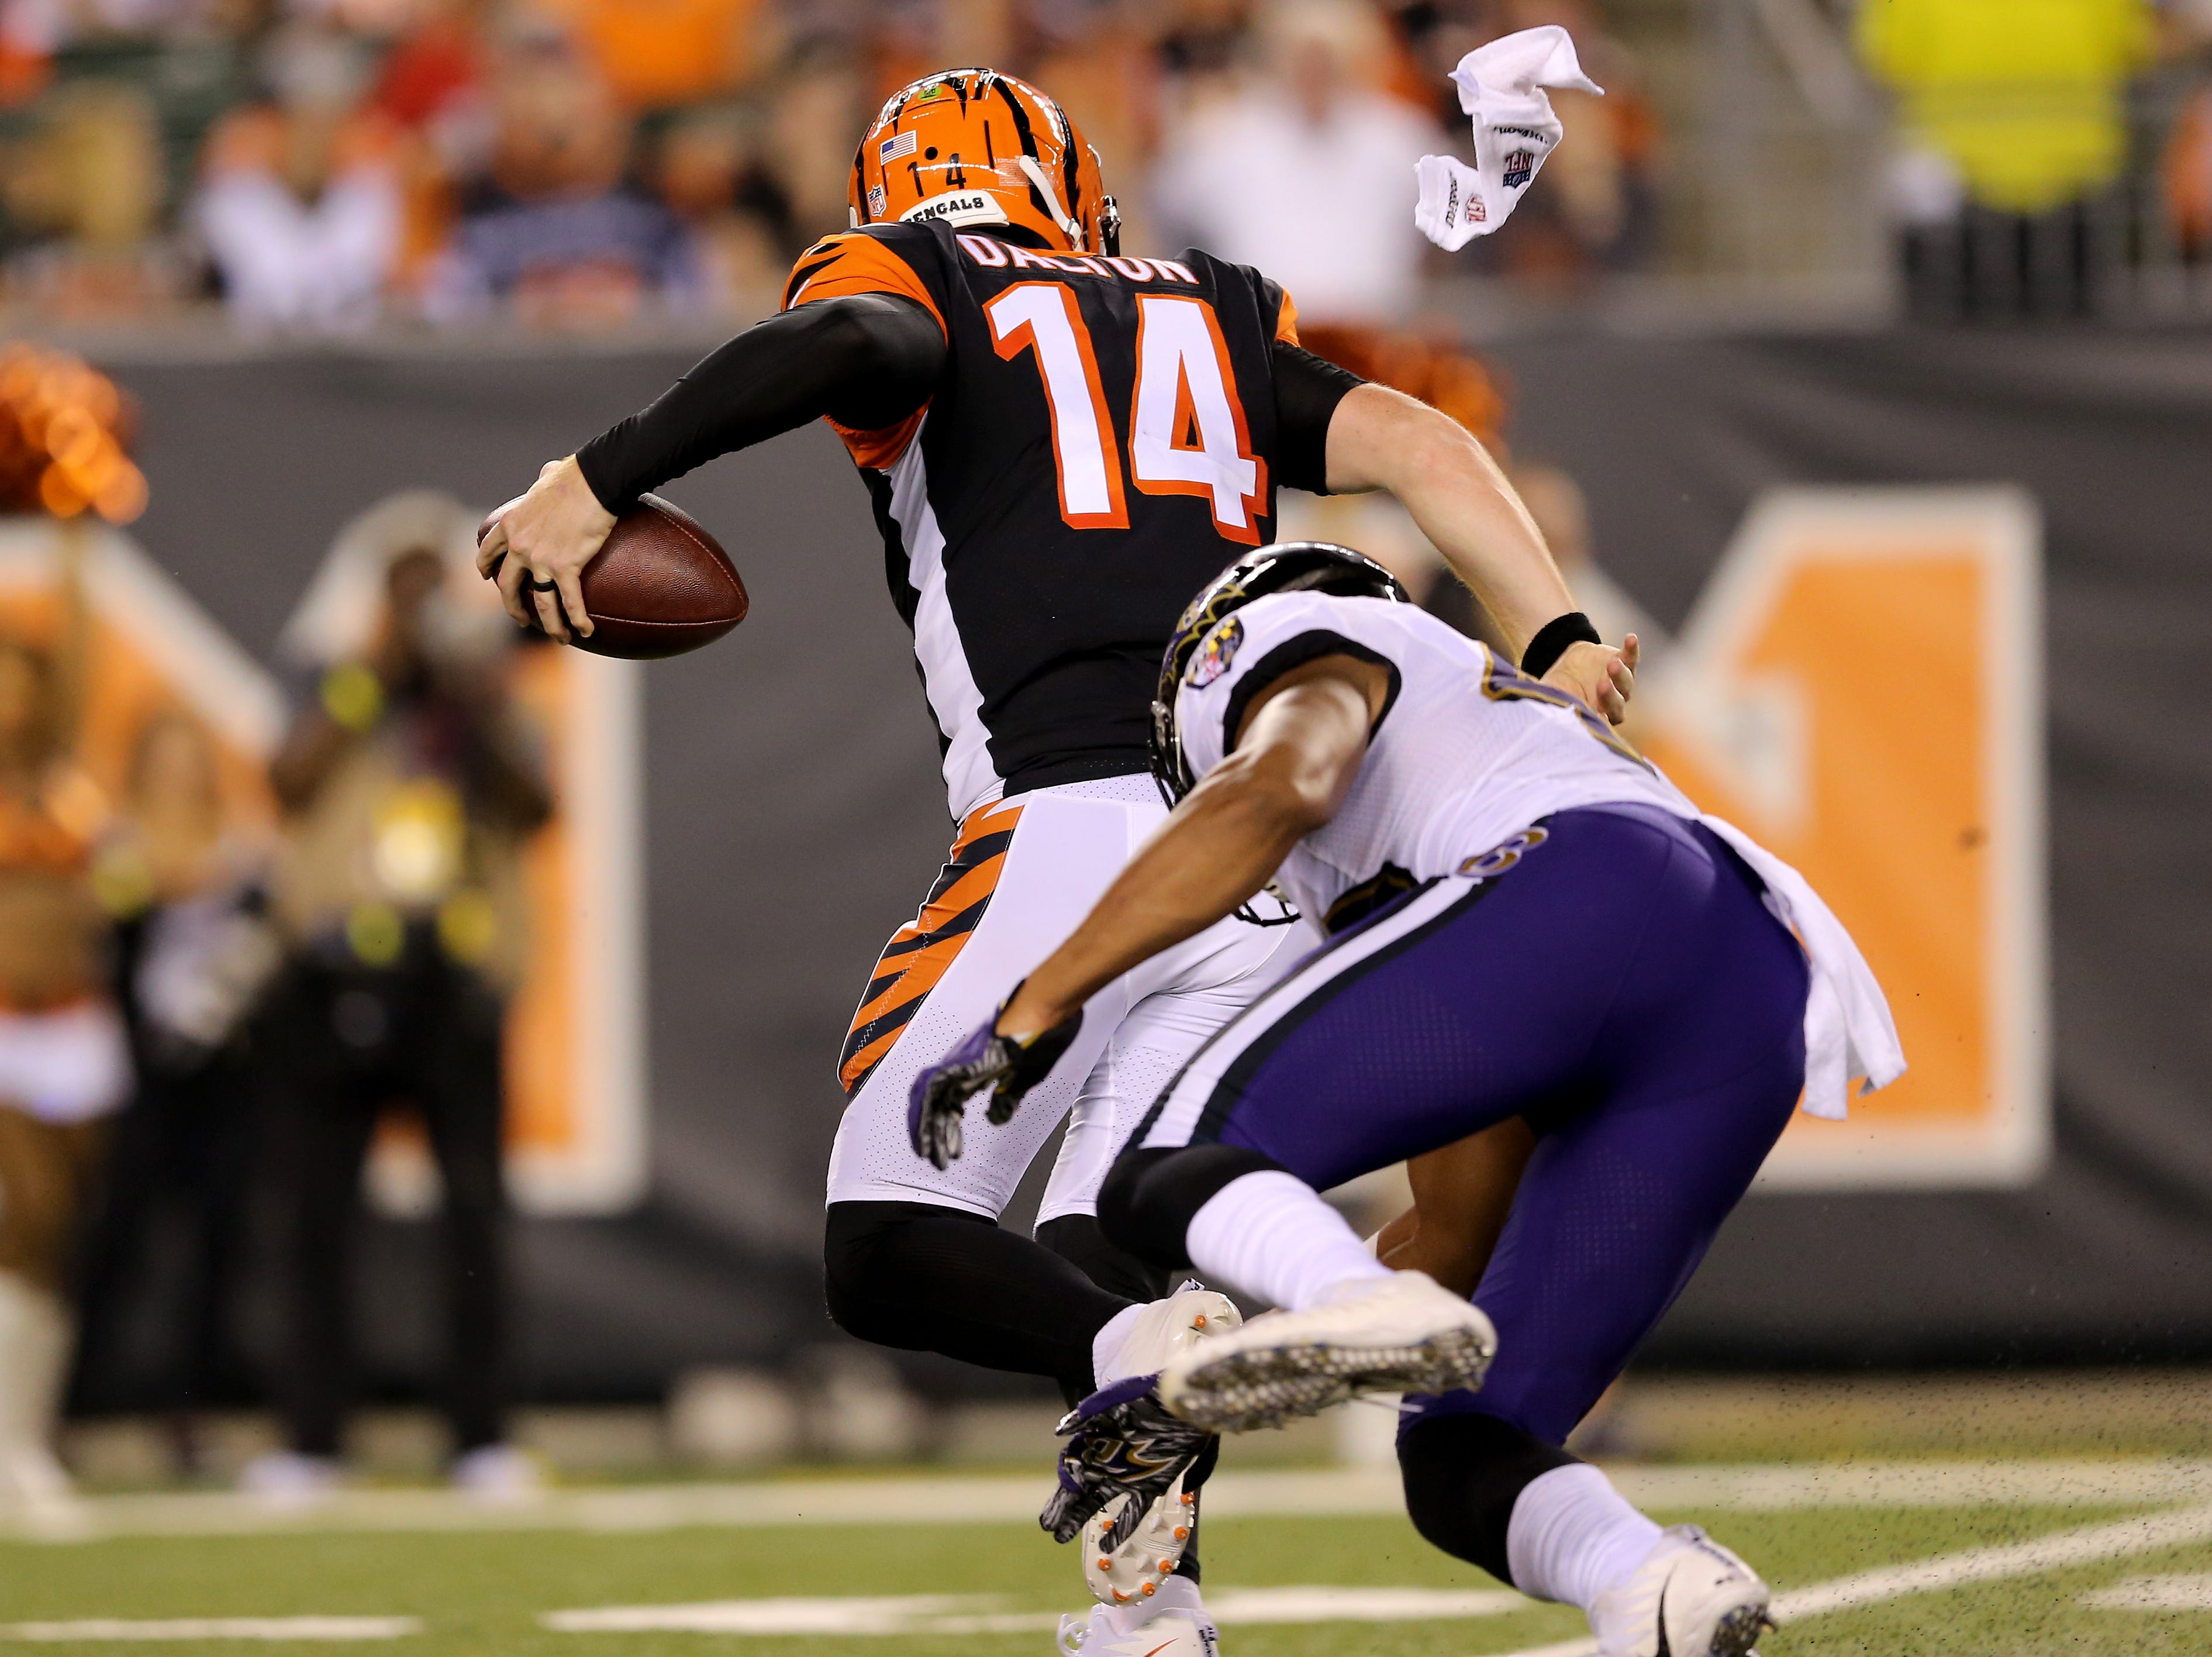 Cincinnati Bengals quarterback Andy Dalton (14) escapes pressure in the third quarter during the Week 2 NFL football game between the Baltimore Ravens and the Cincinnati Bengals, Friday, Sept. 14, 2018, Paul Brown Stadium in Cincinnati. Cincinnati won 34-23.